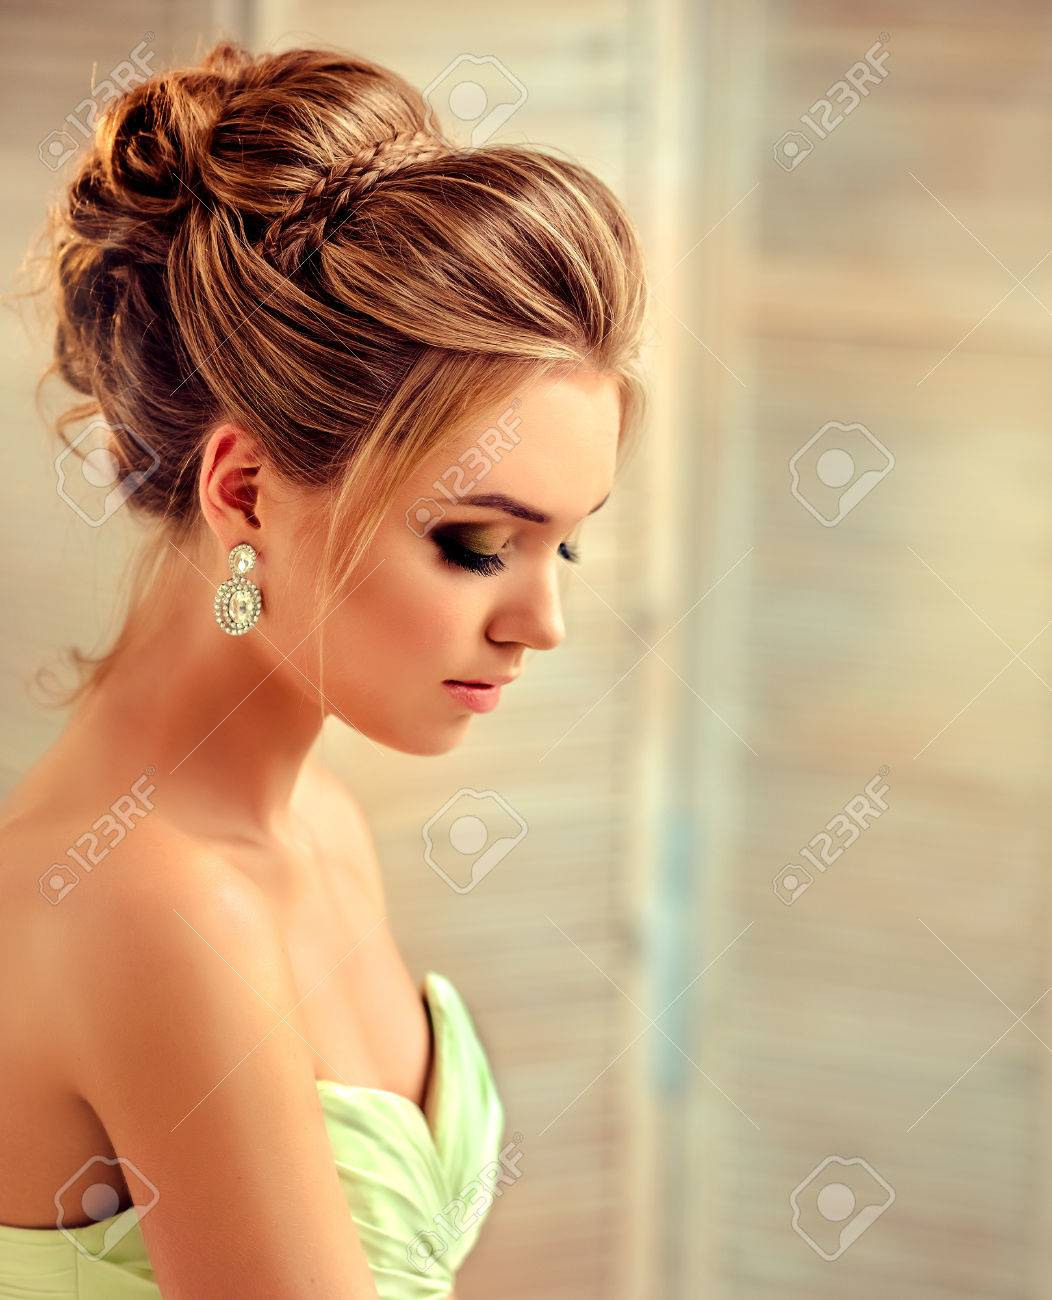 10 Luxus Frisur Abendkleid StylishDesigner Elegant Frisur Abendkleid Boutique